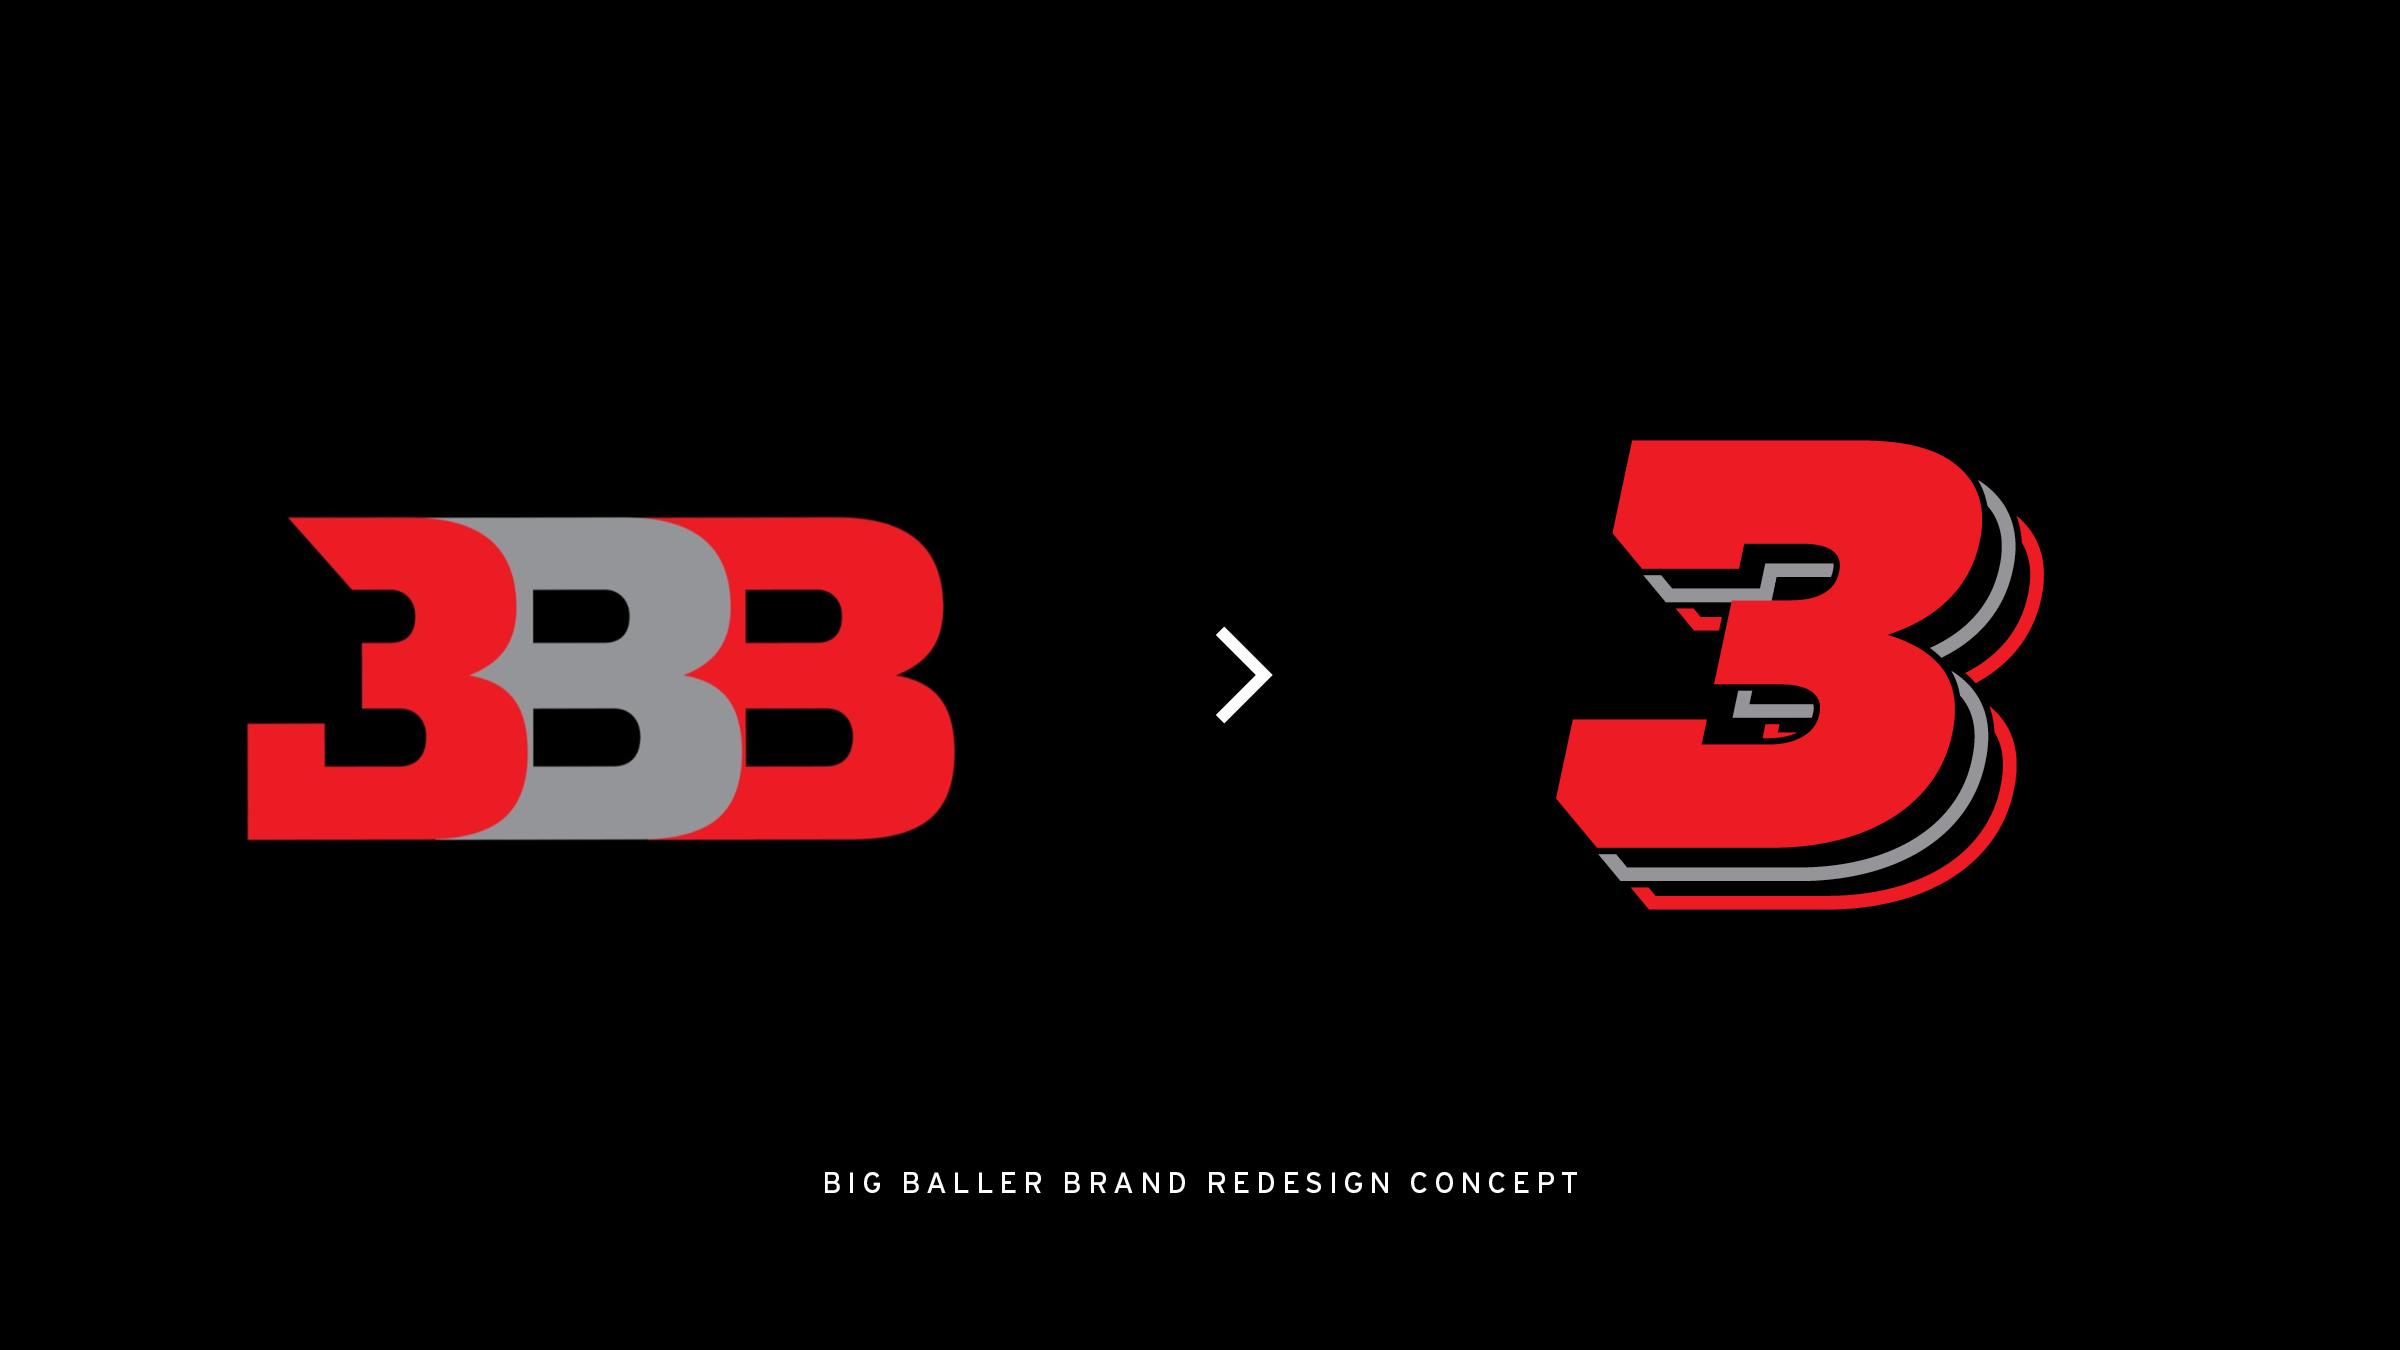 BigBallerBrand_Redesign_OldVsNew_Anthony_Mejia.jpg